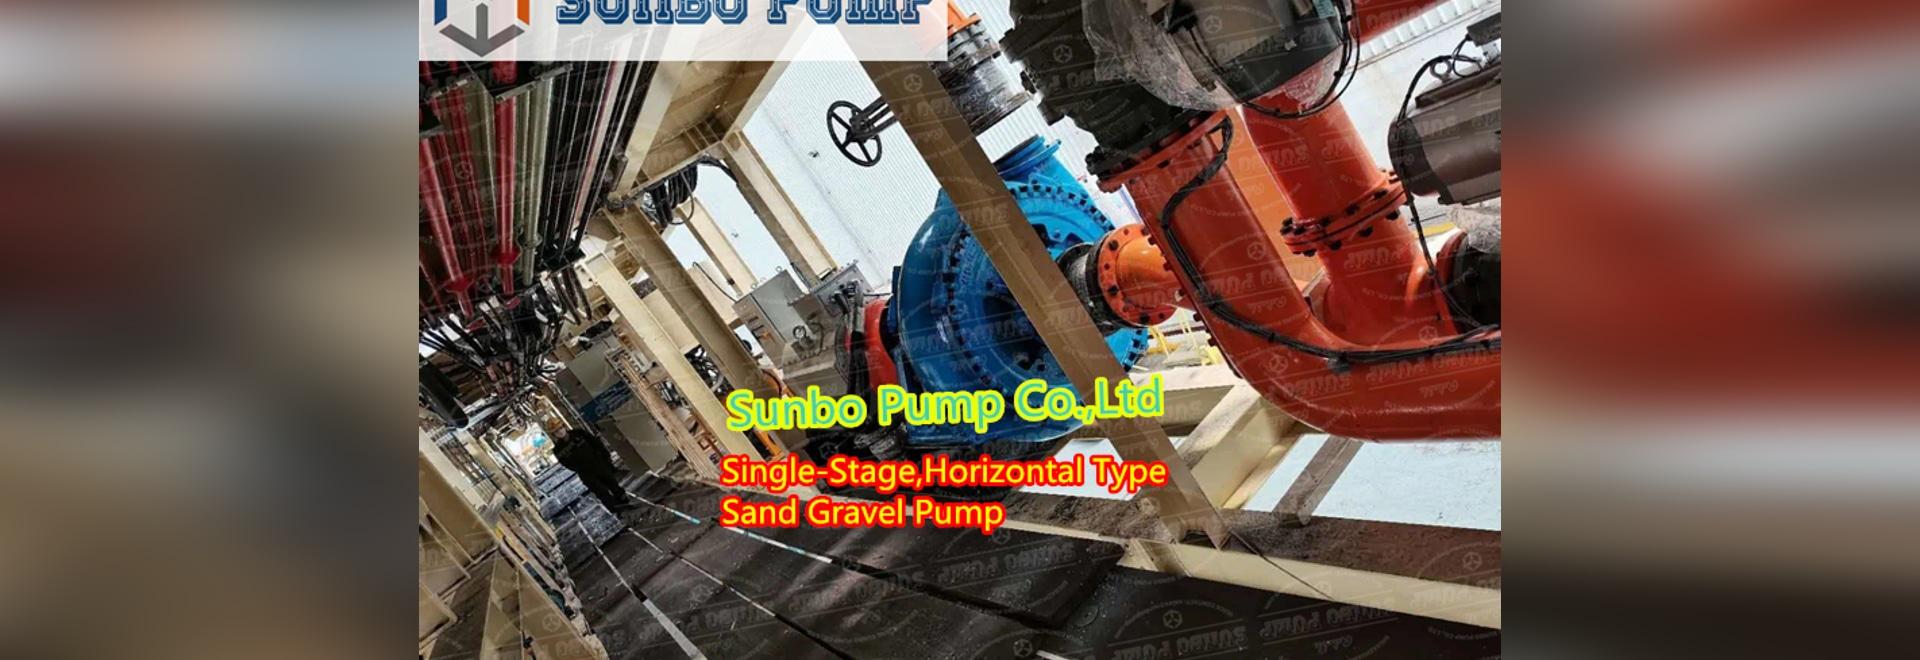 Single Casing Sand Slurry Pump